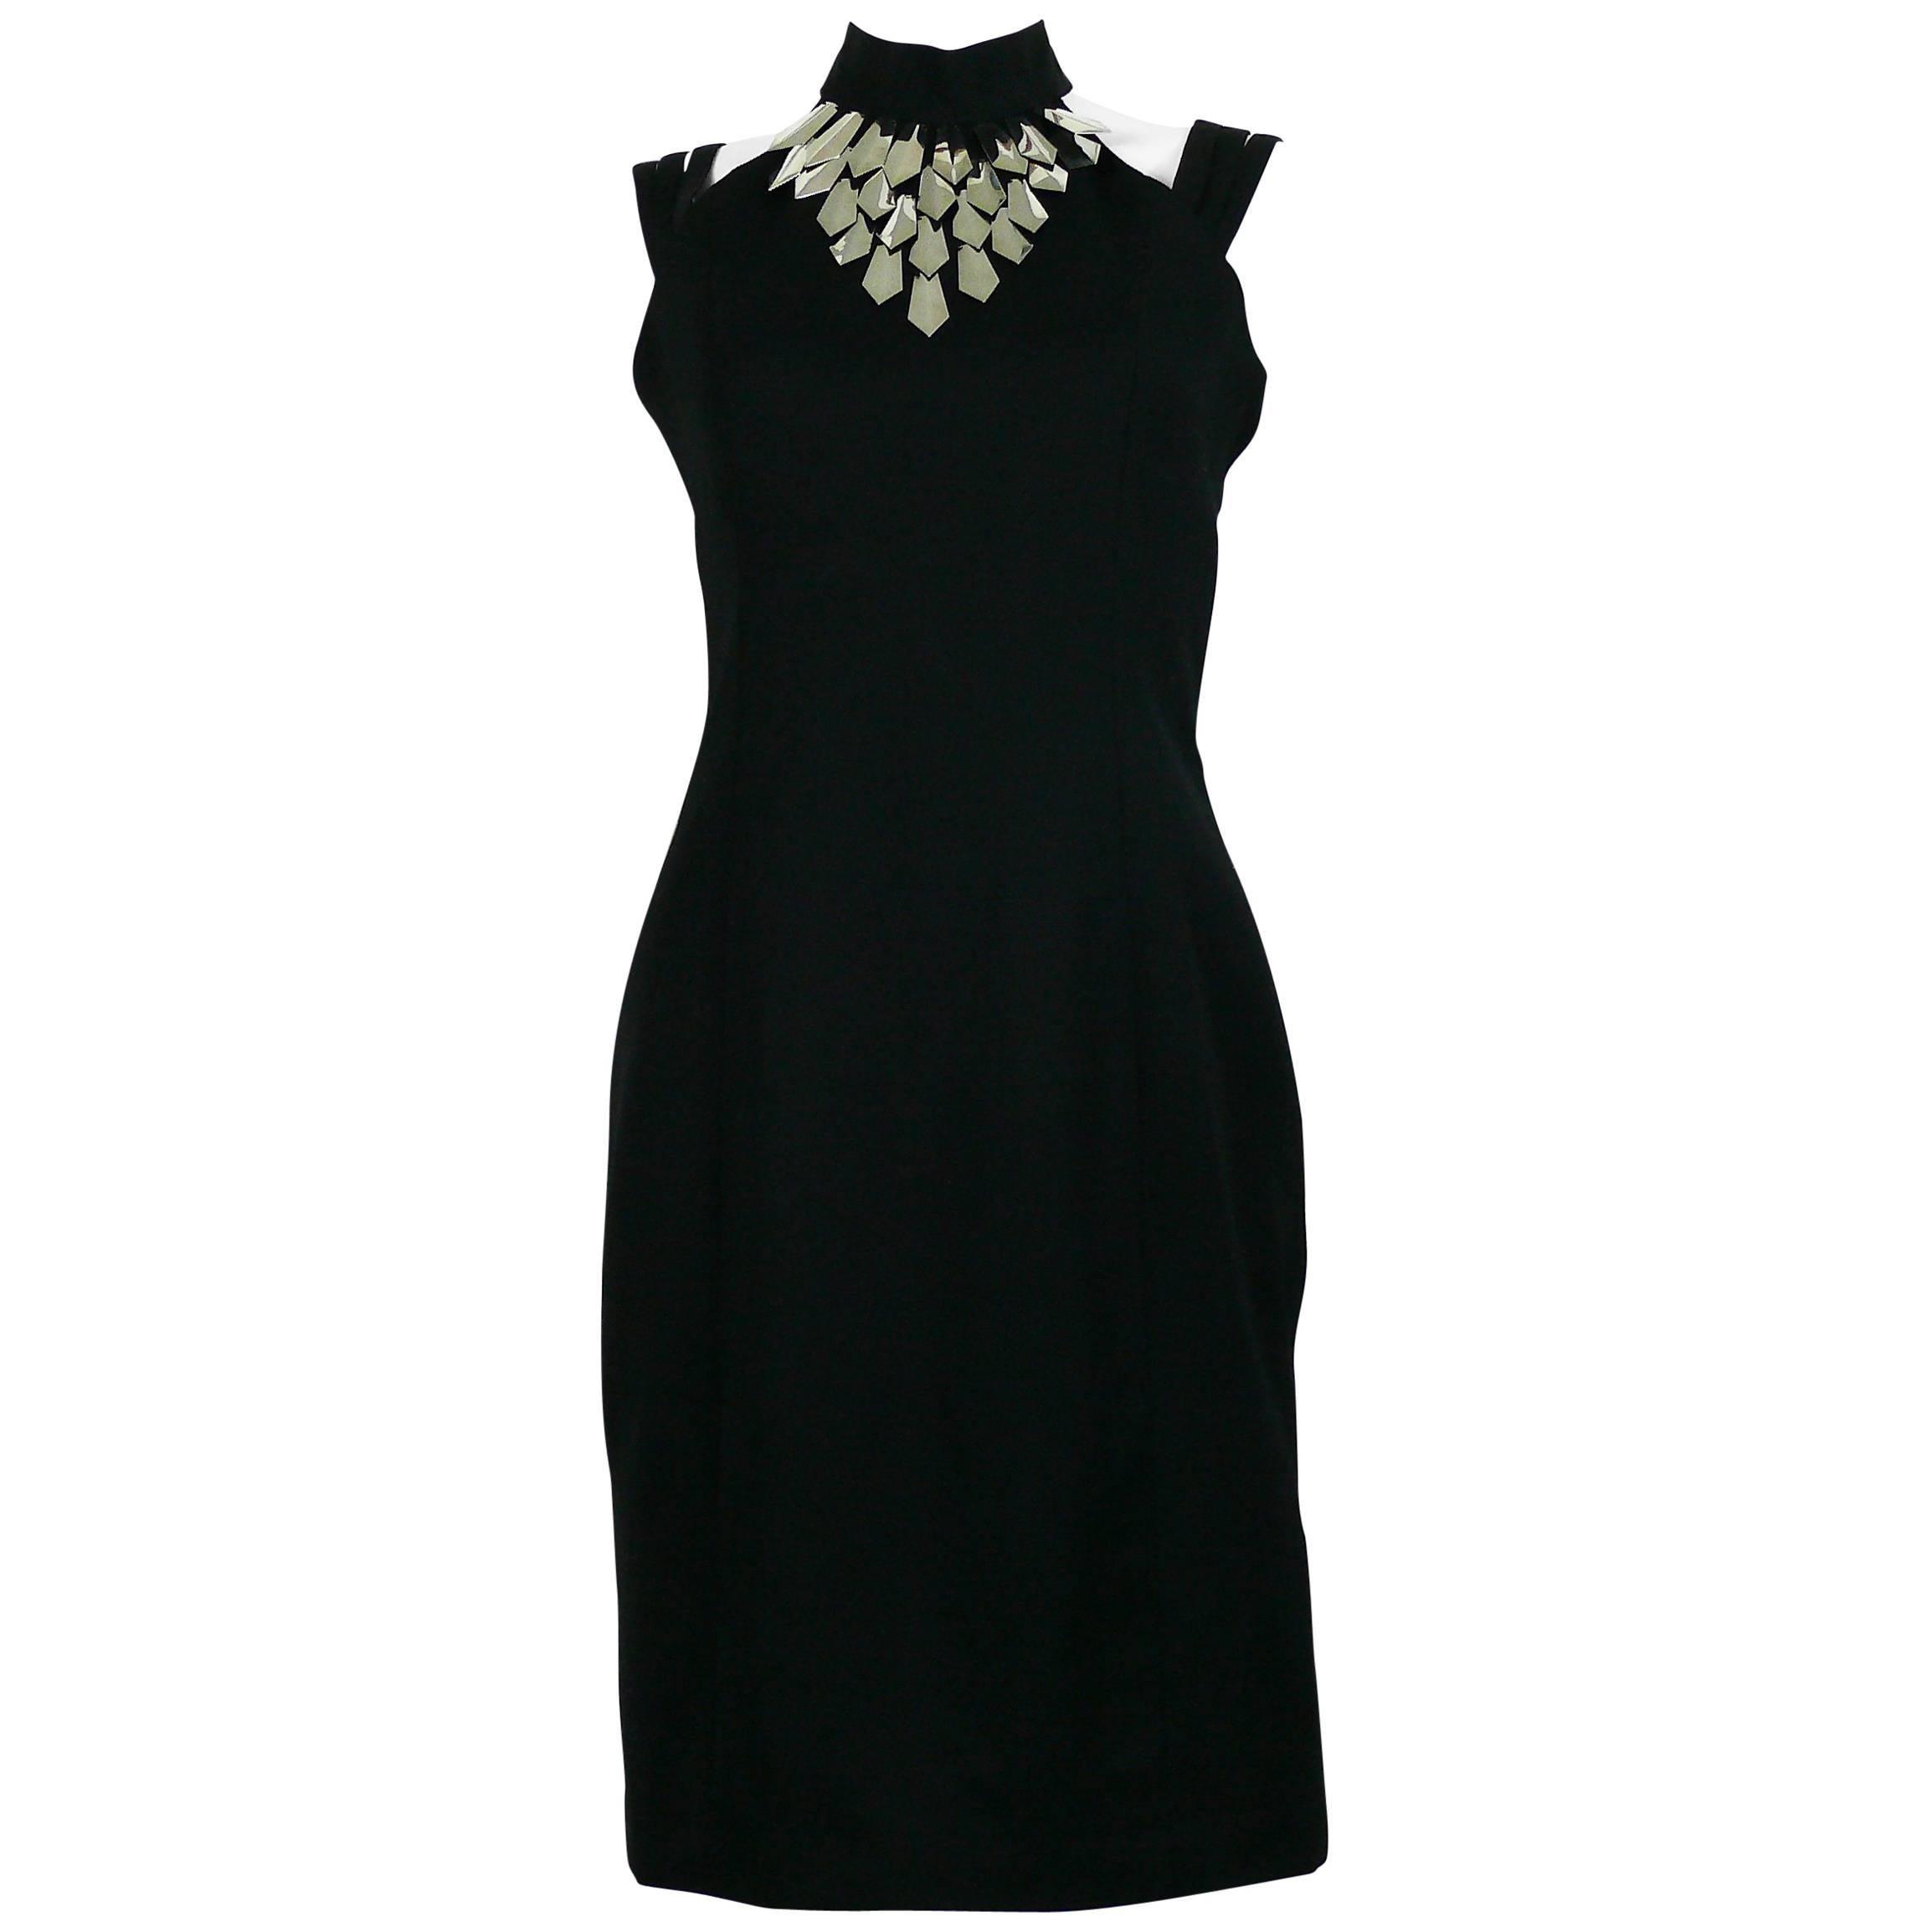 Paco Rabanne Vintage Black Wool Halter Dress with Metal Collar US Size 6